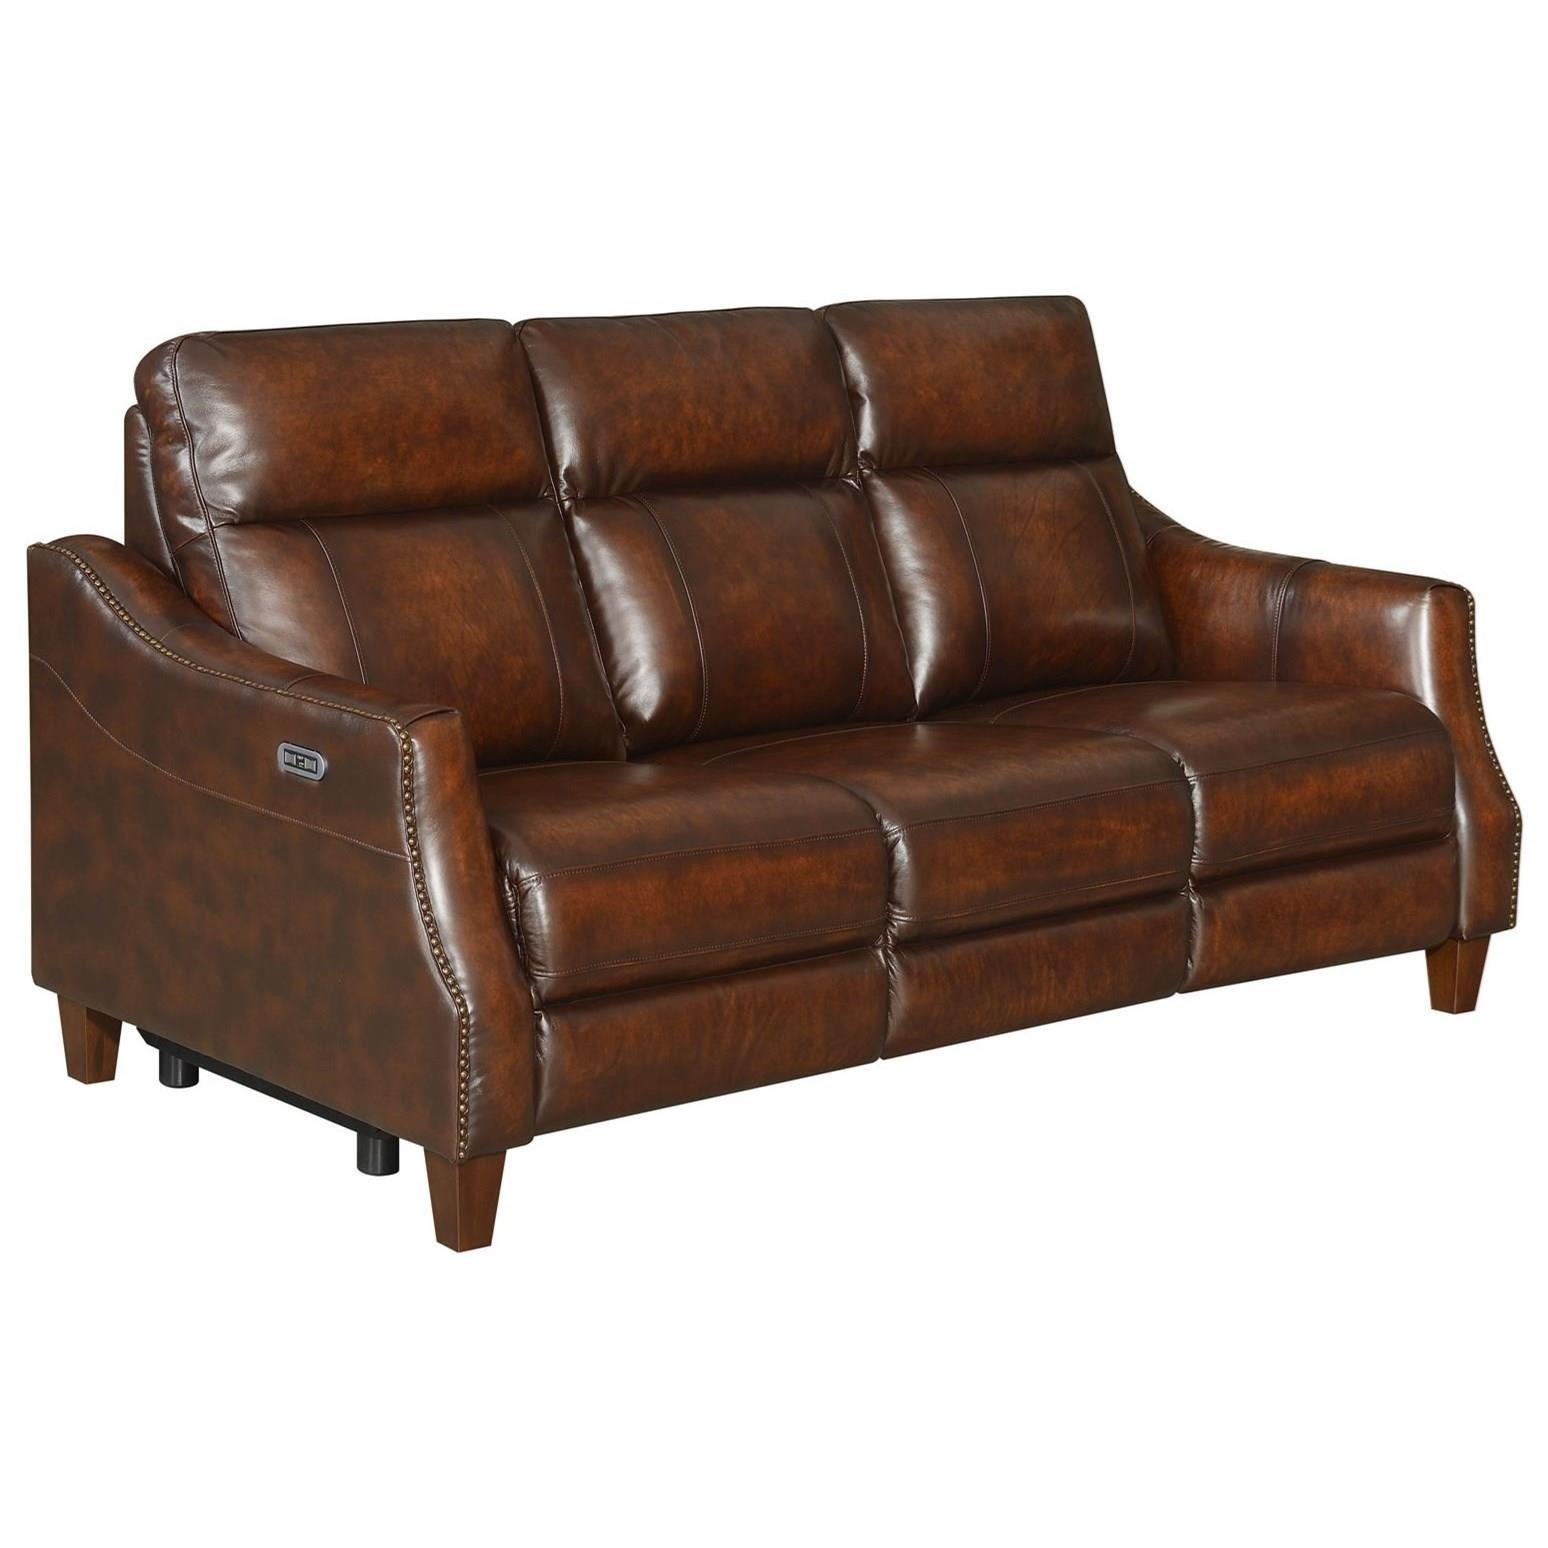 Akari Dual-Power Recliner Sofa by Steve Silver at Standard Furniture